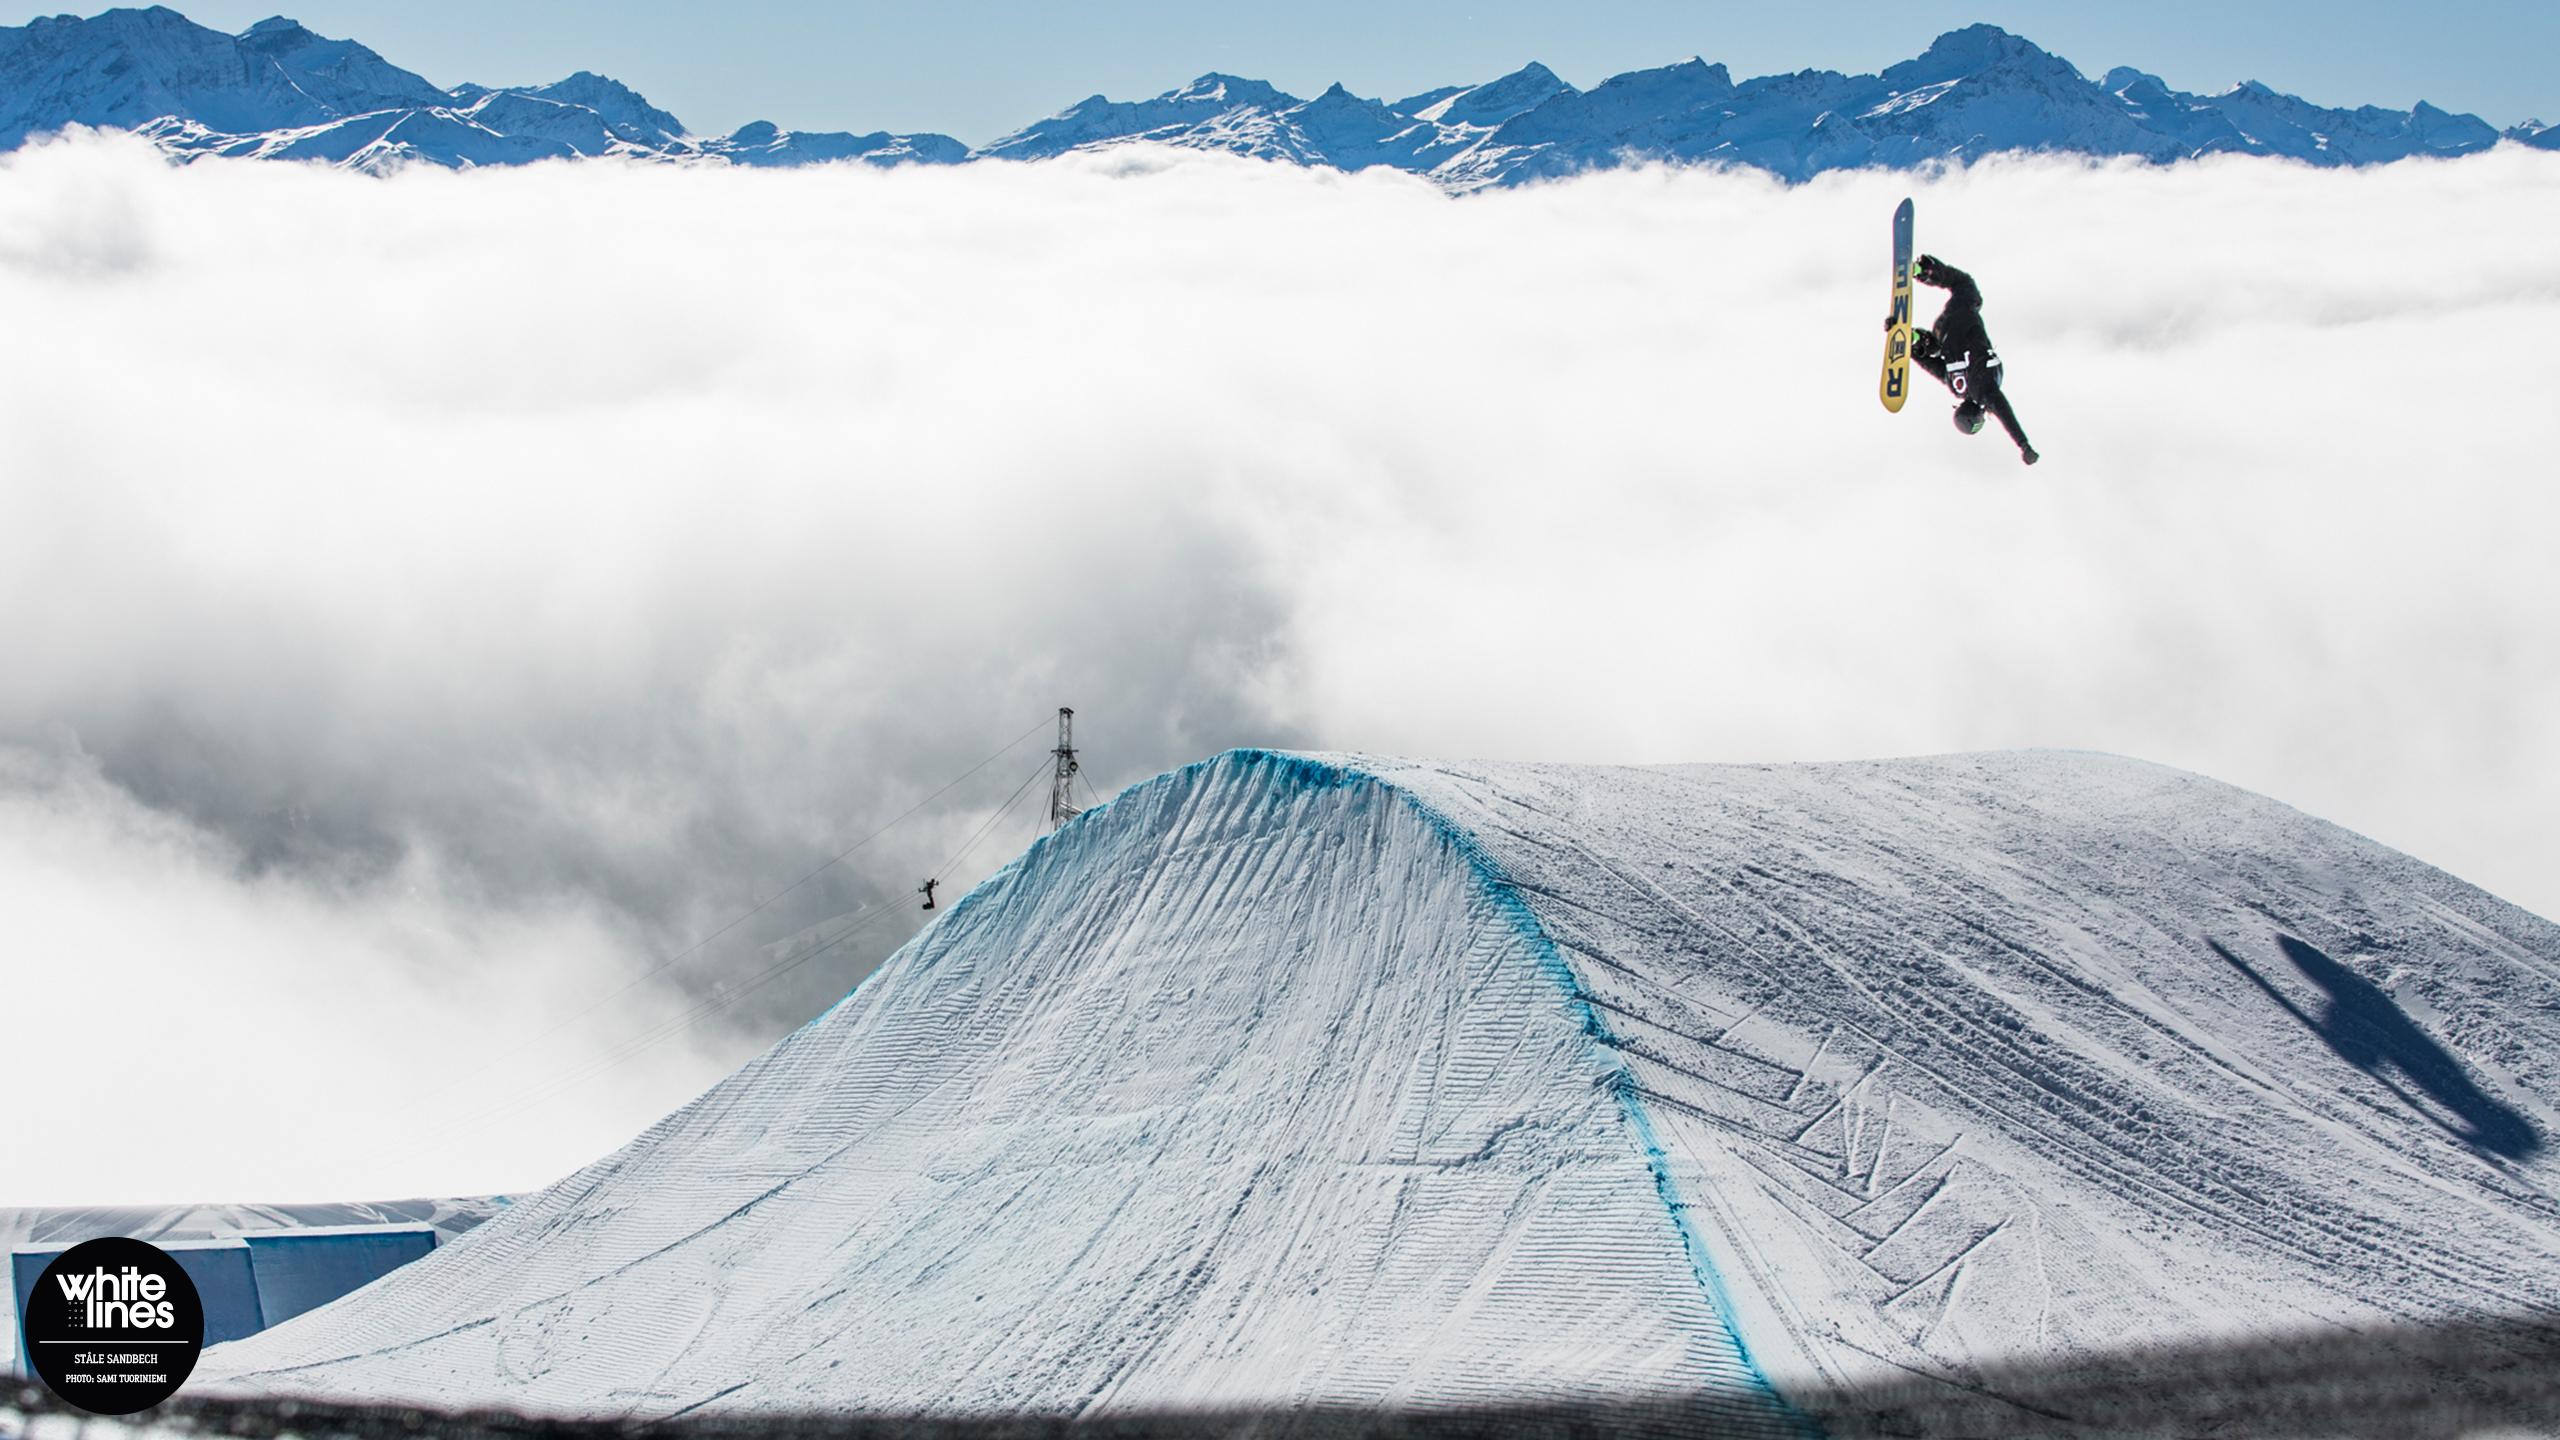 Snowboarding Snowboard Winter Snow Sports Ski Wallpaper 2560x1440 1183269 Wallpaperup